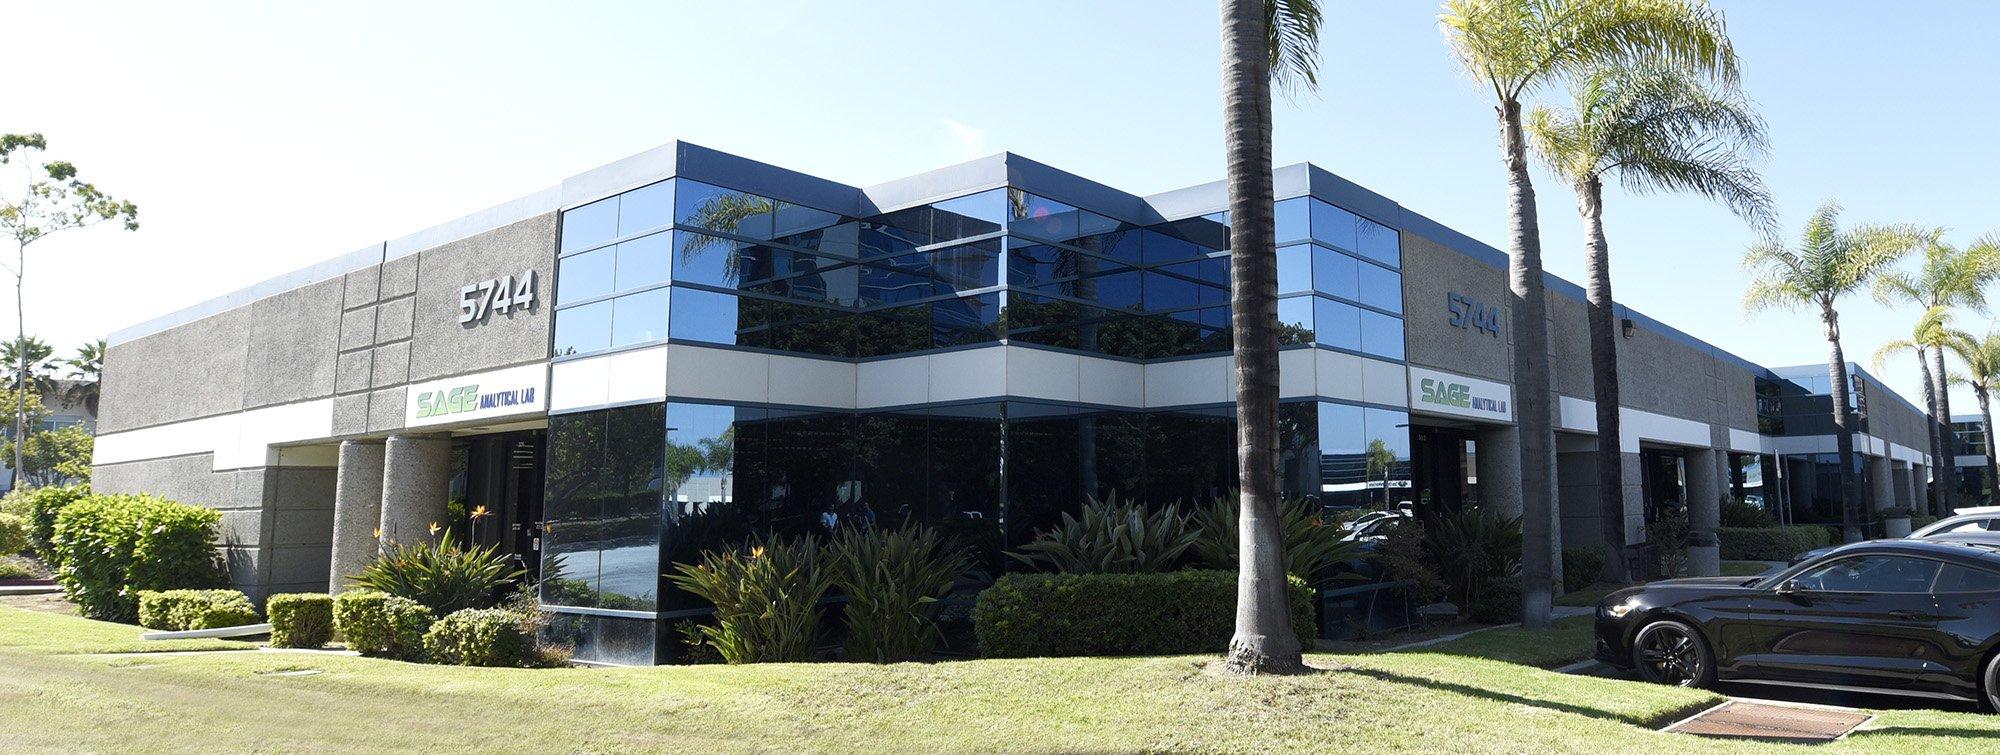 Failure Analysis Laboratory San Diego